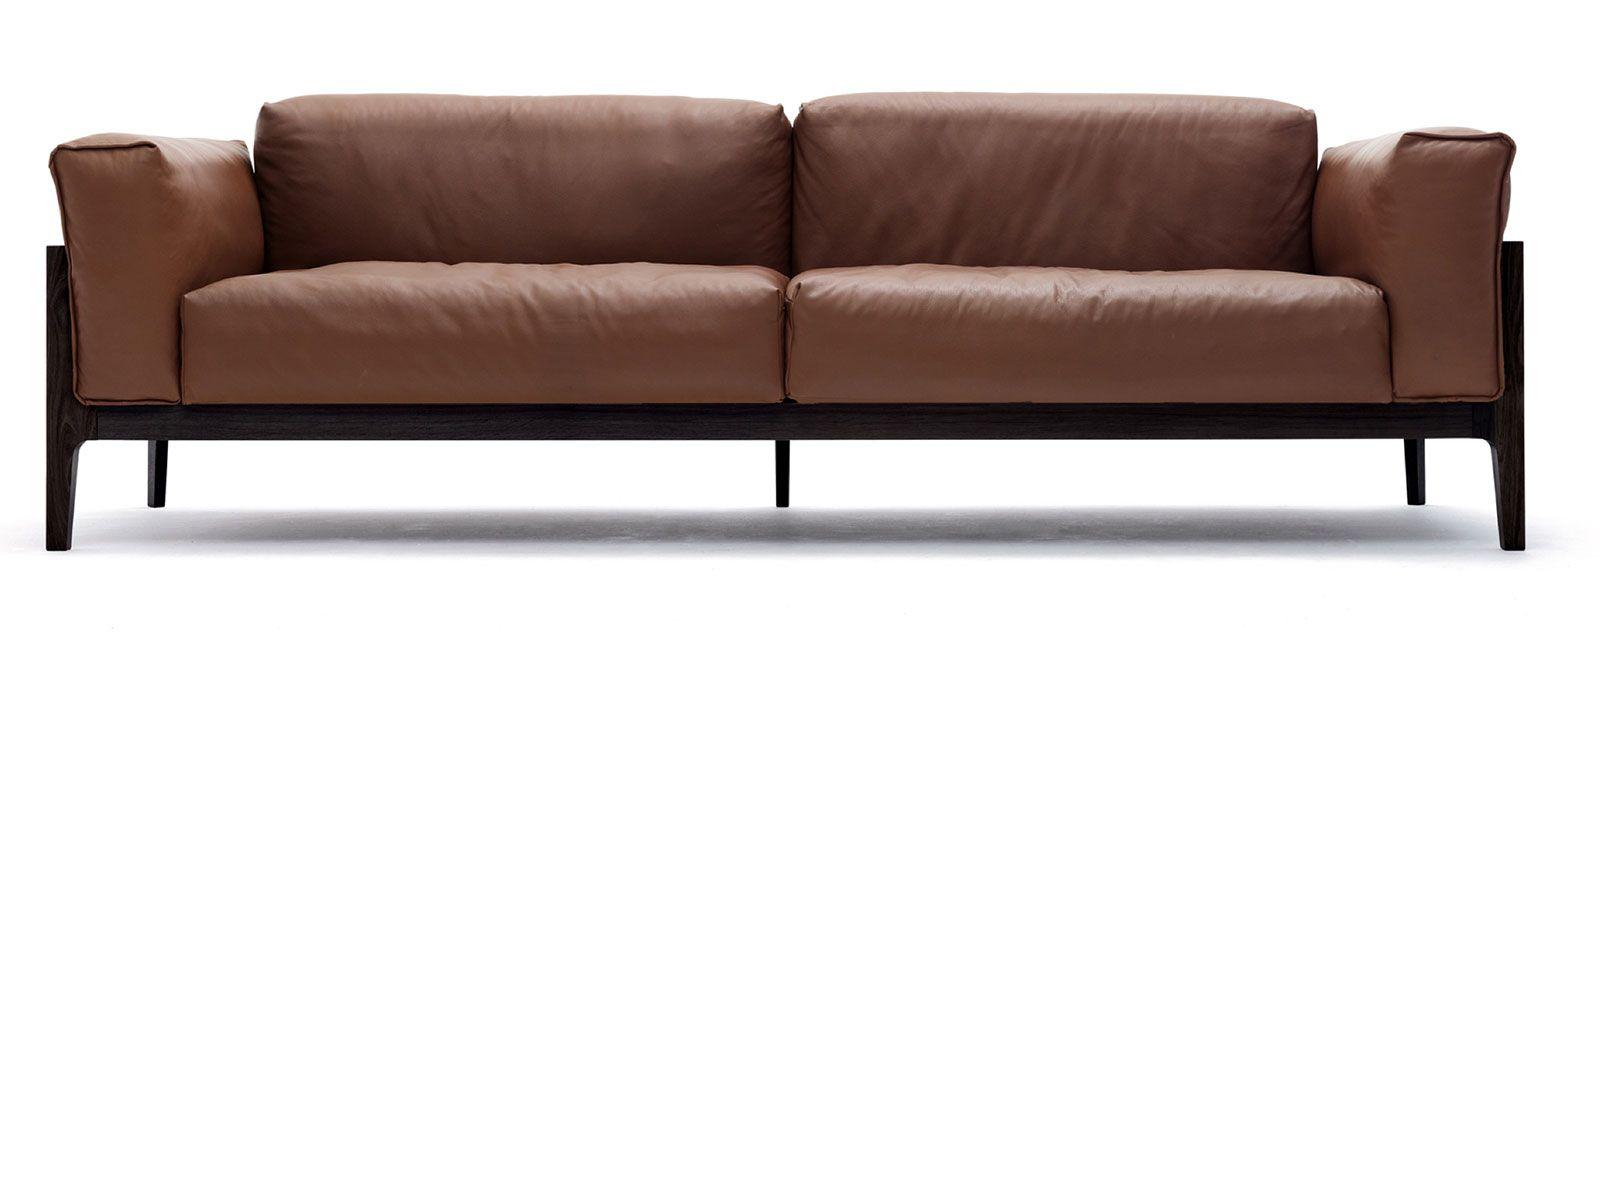 Epic machalke denver sofa